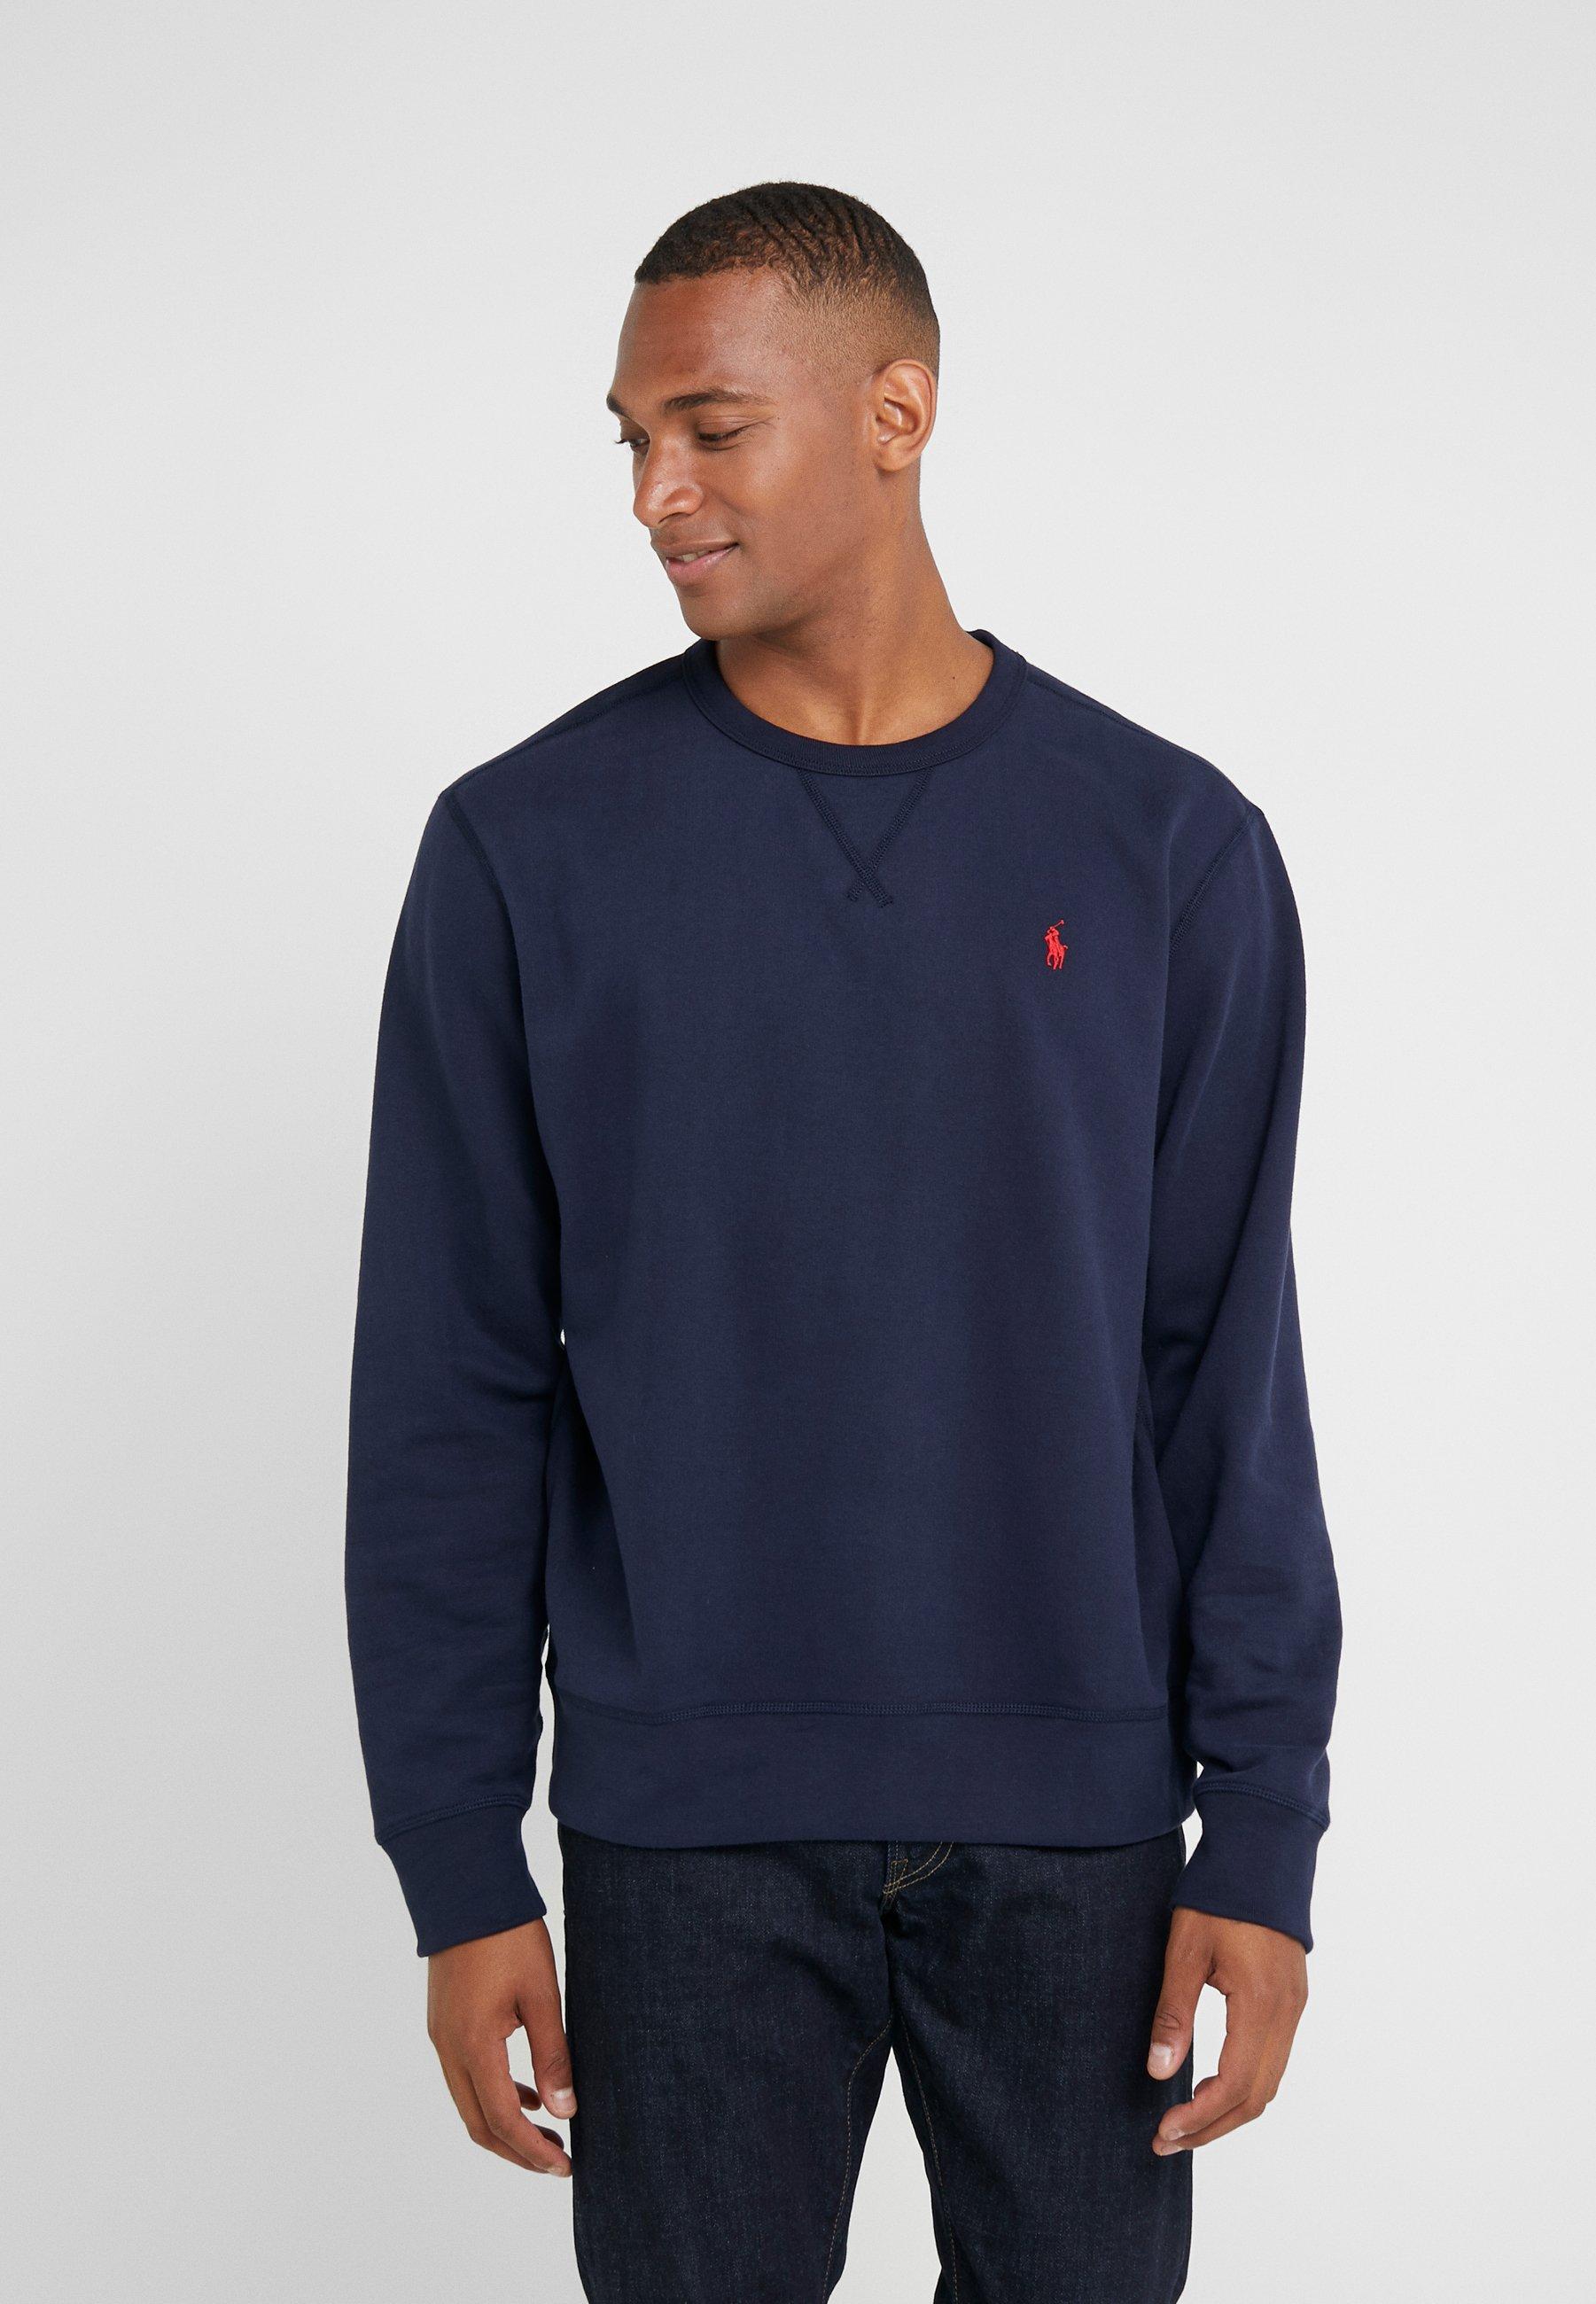 Ralph Lauren Navy Ralph SweatshirtCruise Polo Polo Navy SweatshirtCruise Lauren XiTZuOPk